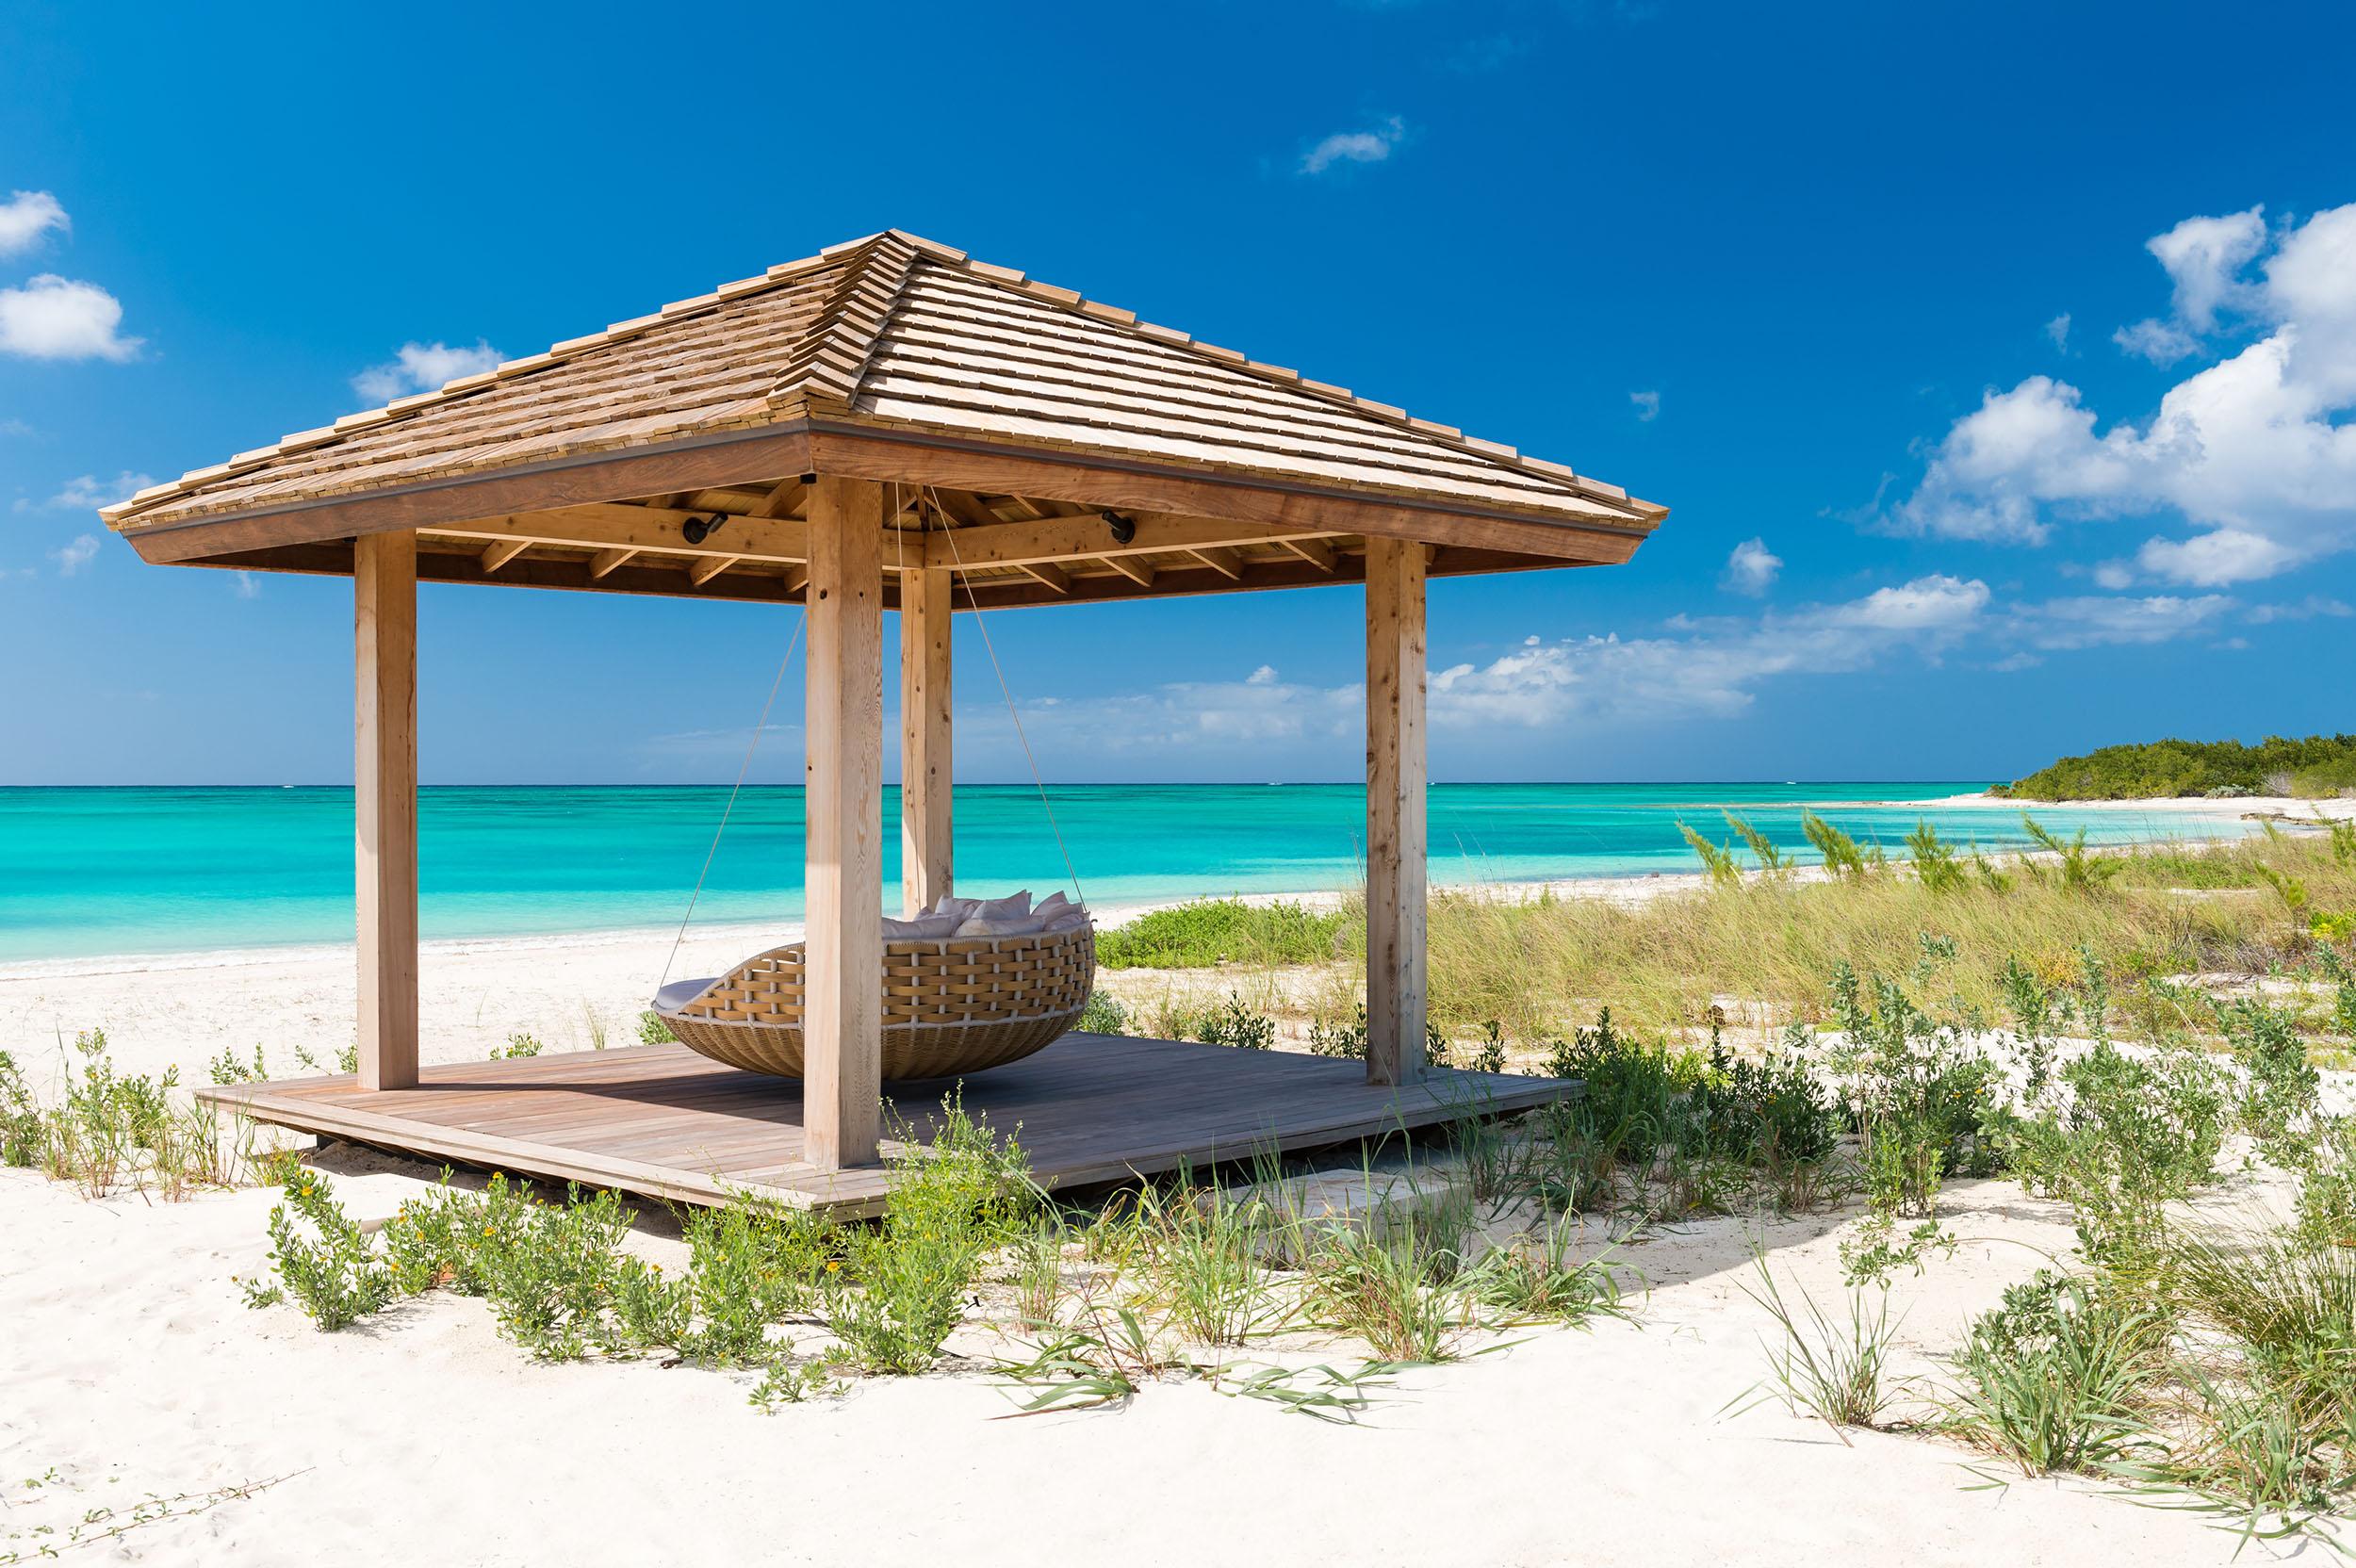 Serenity - view of the beach cabana